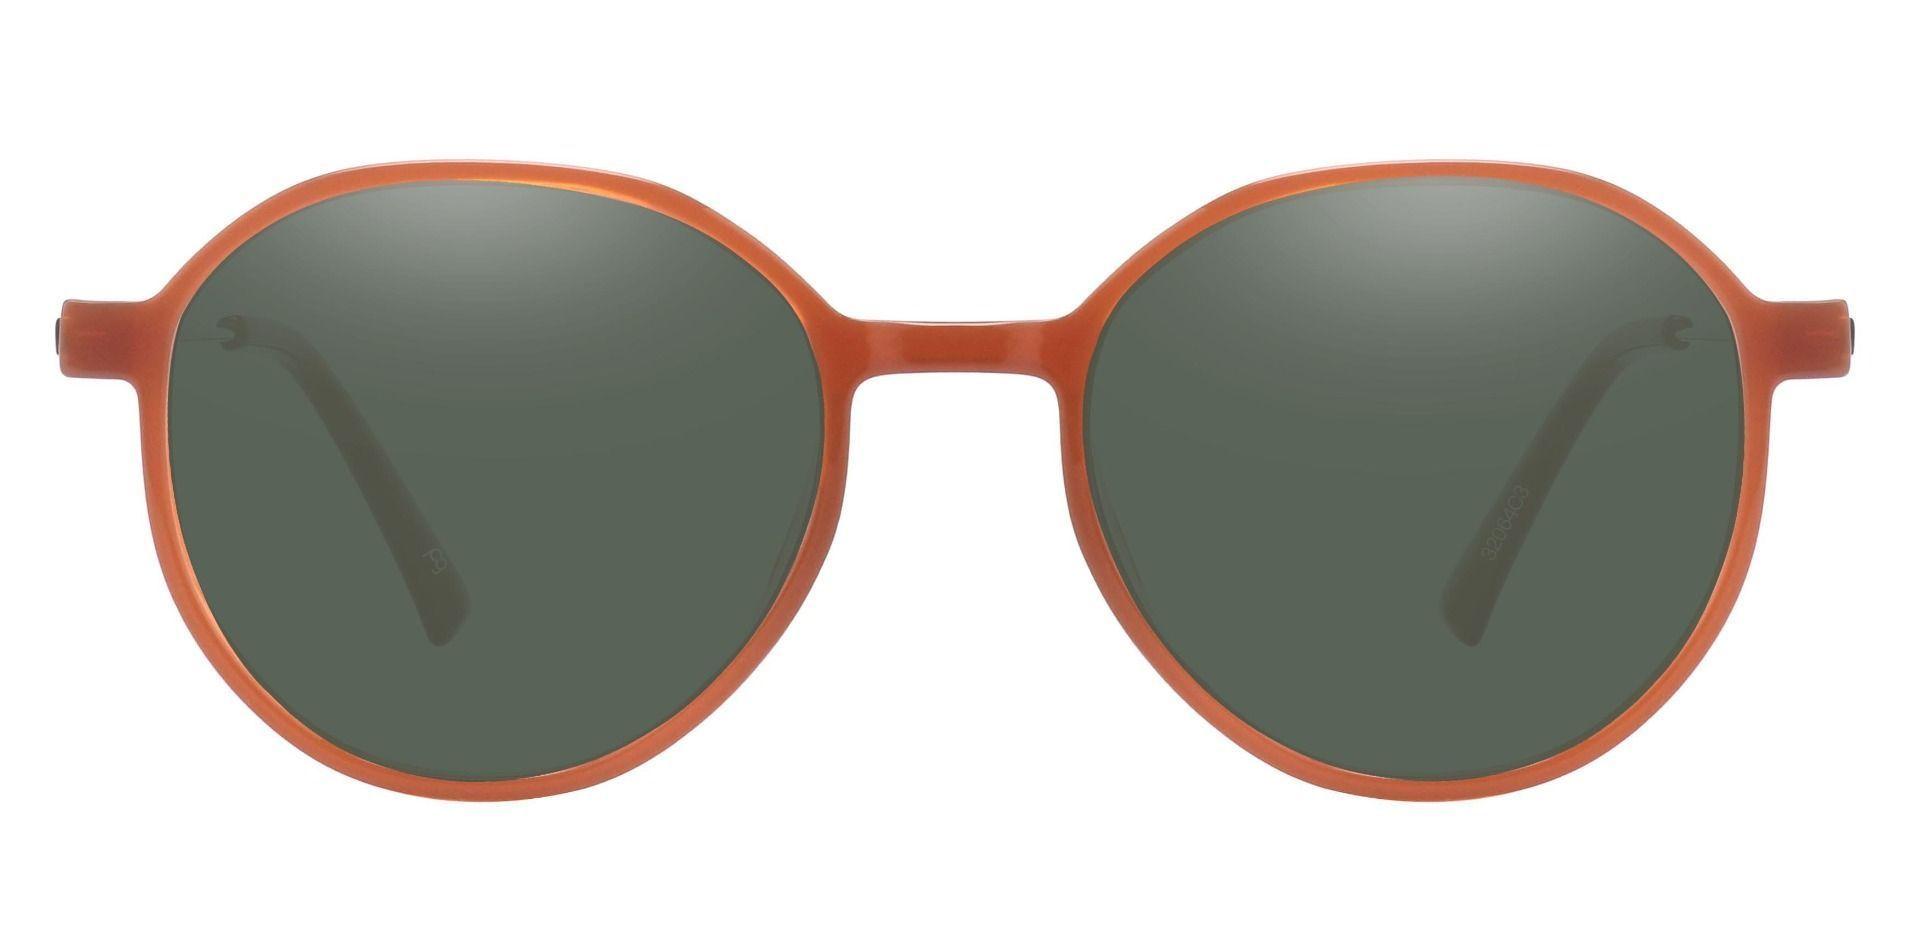 Daytona Geometric Lined Bifocal Sunglasses - Brown Frame With Green Lenses